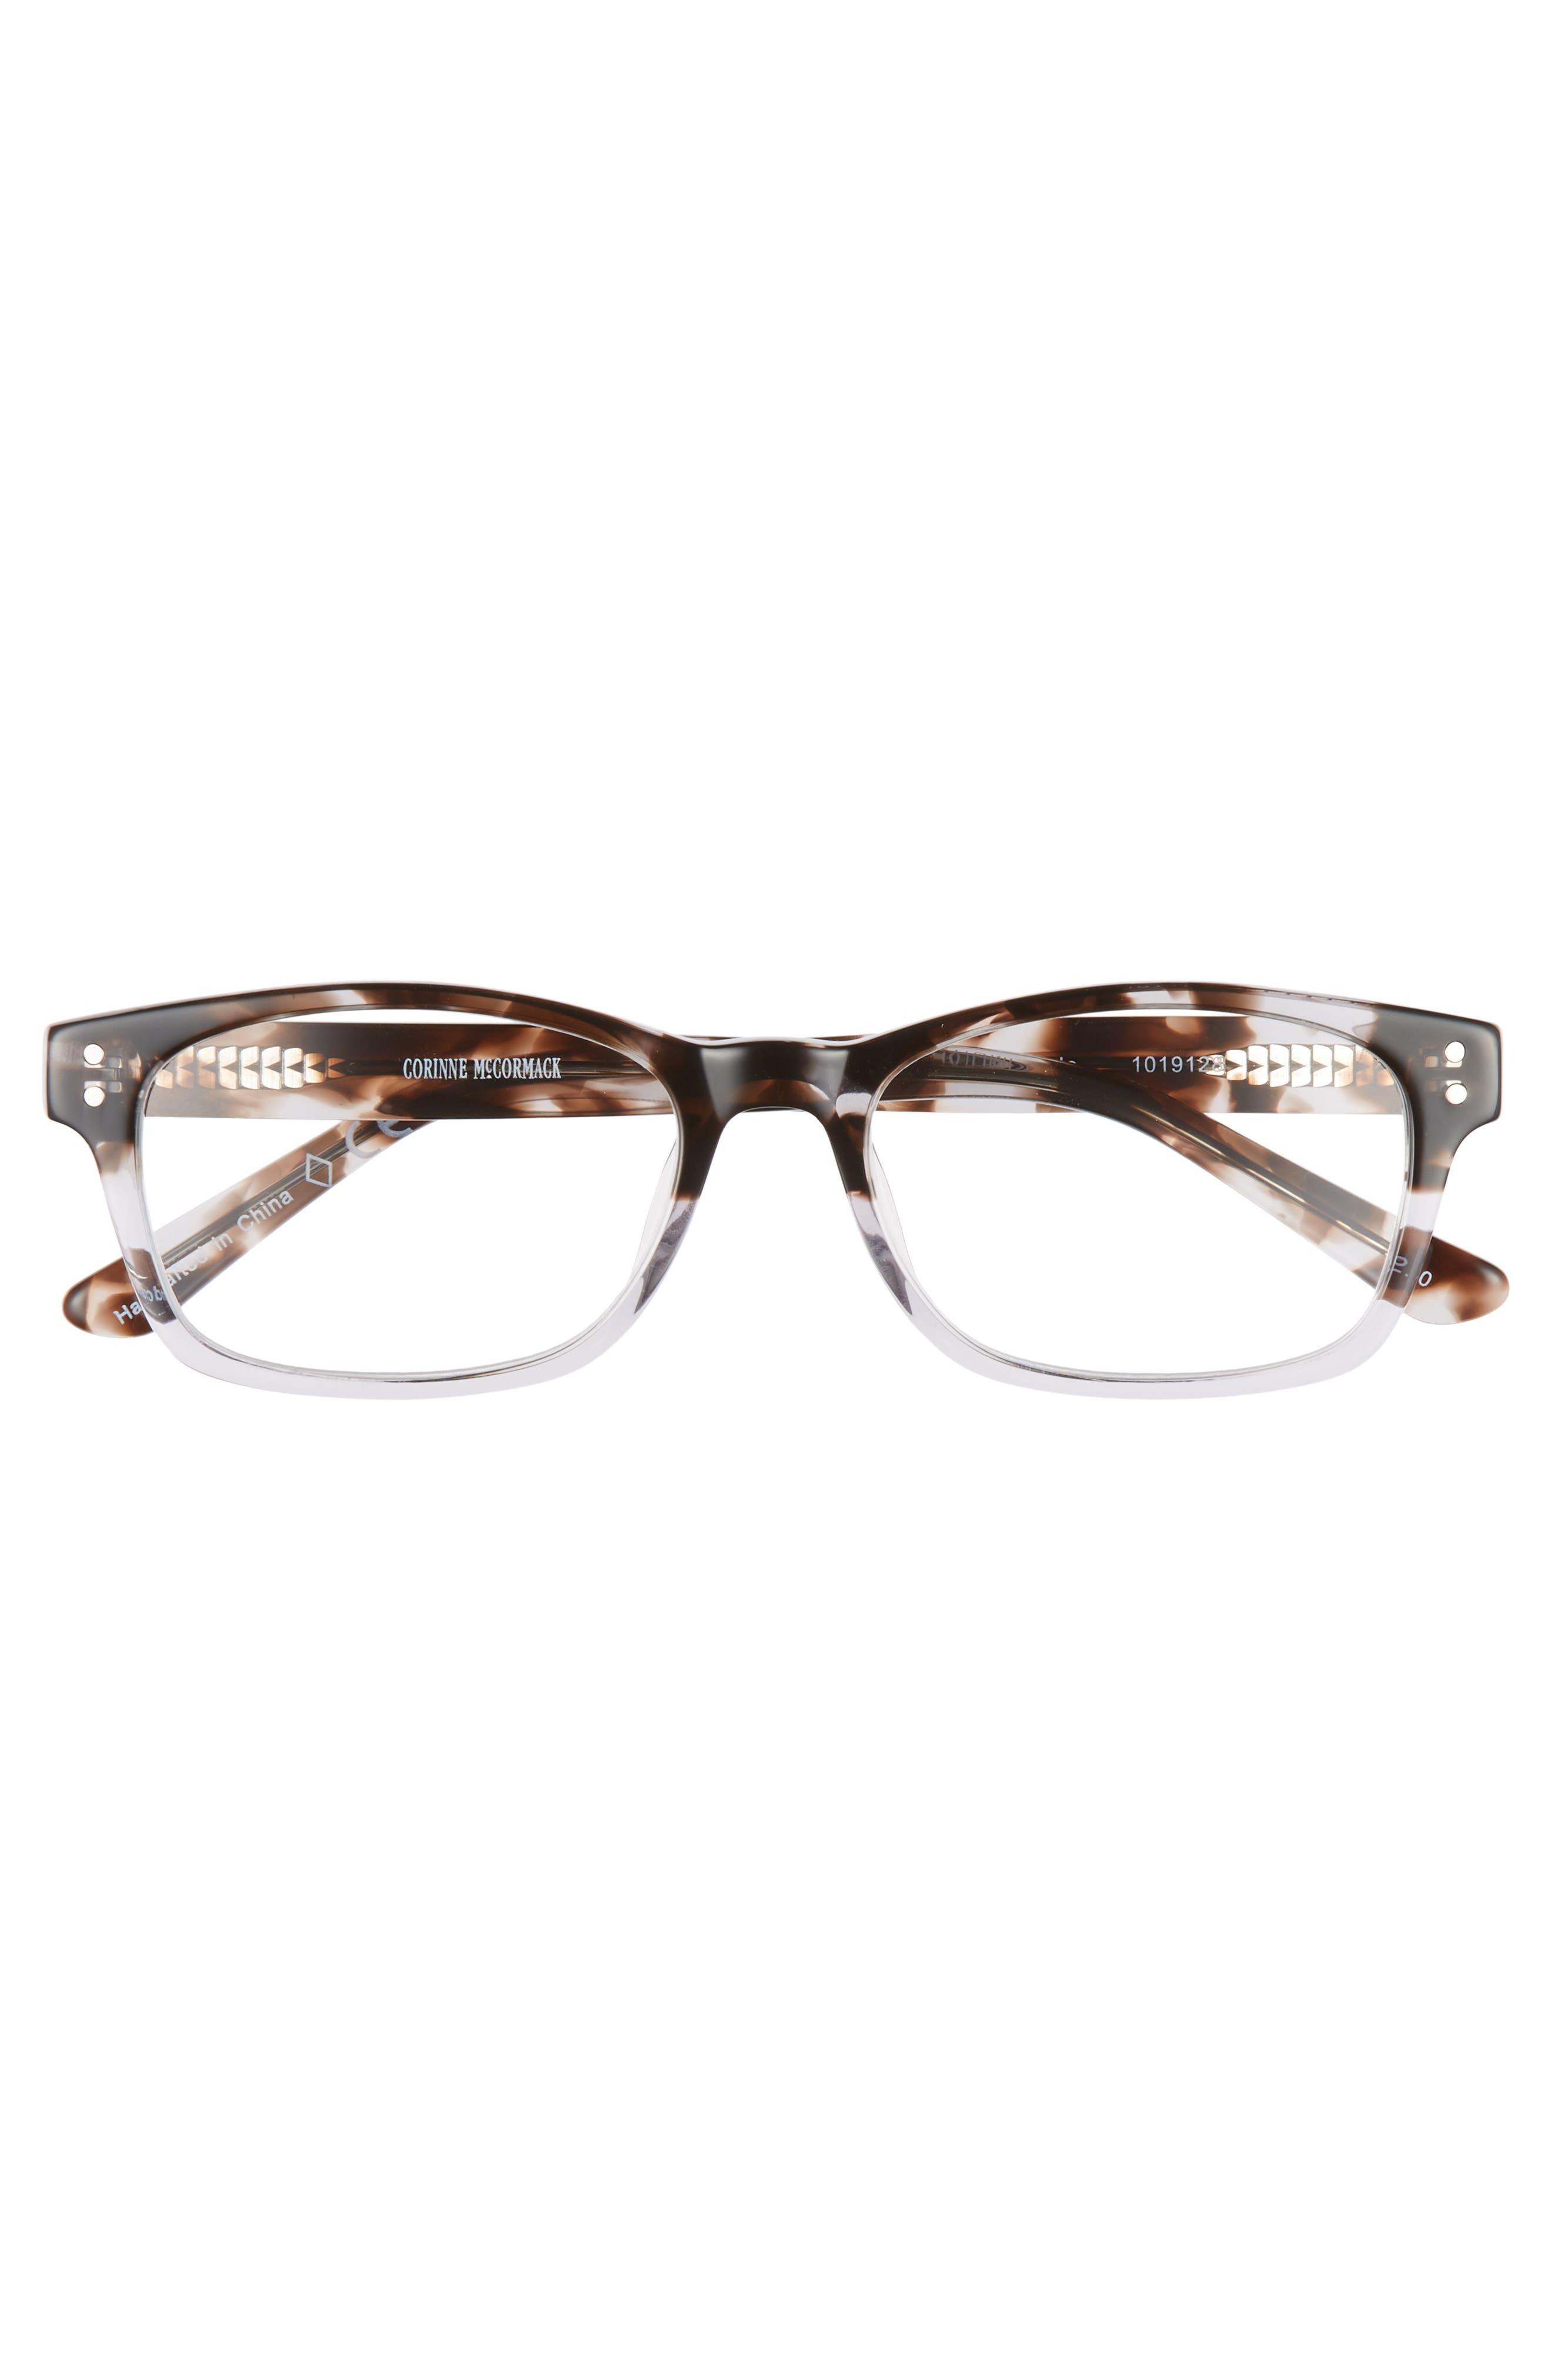 Edie 52mm Reading Glasses,                             Alternate thumbnail 3, color,                             GREY DEMI FADE